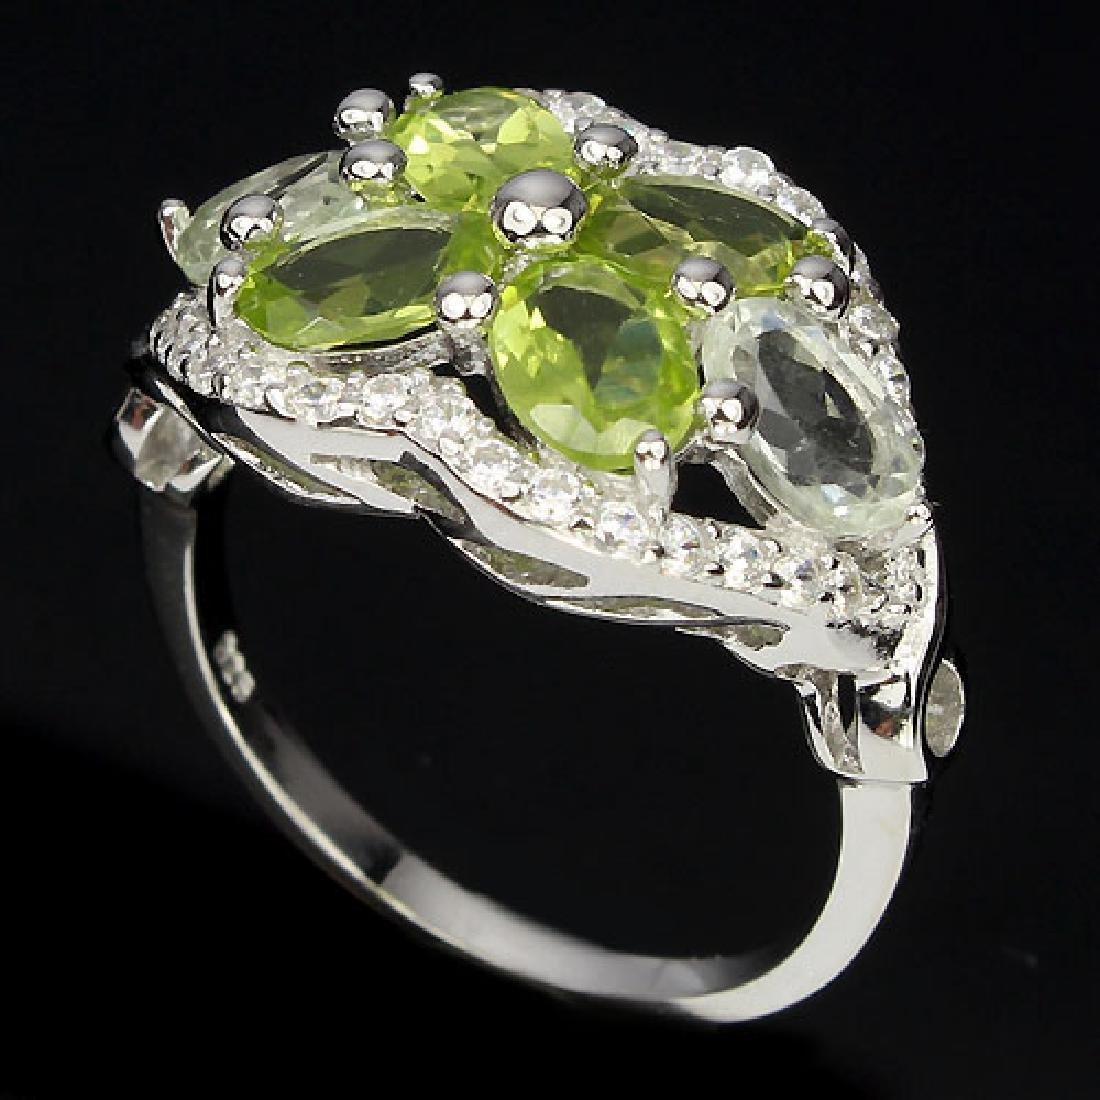 Natural Peridot & Light Tea Green Amethsyt Ring